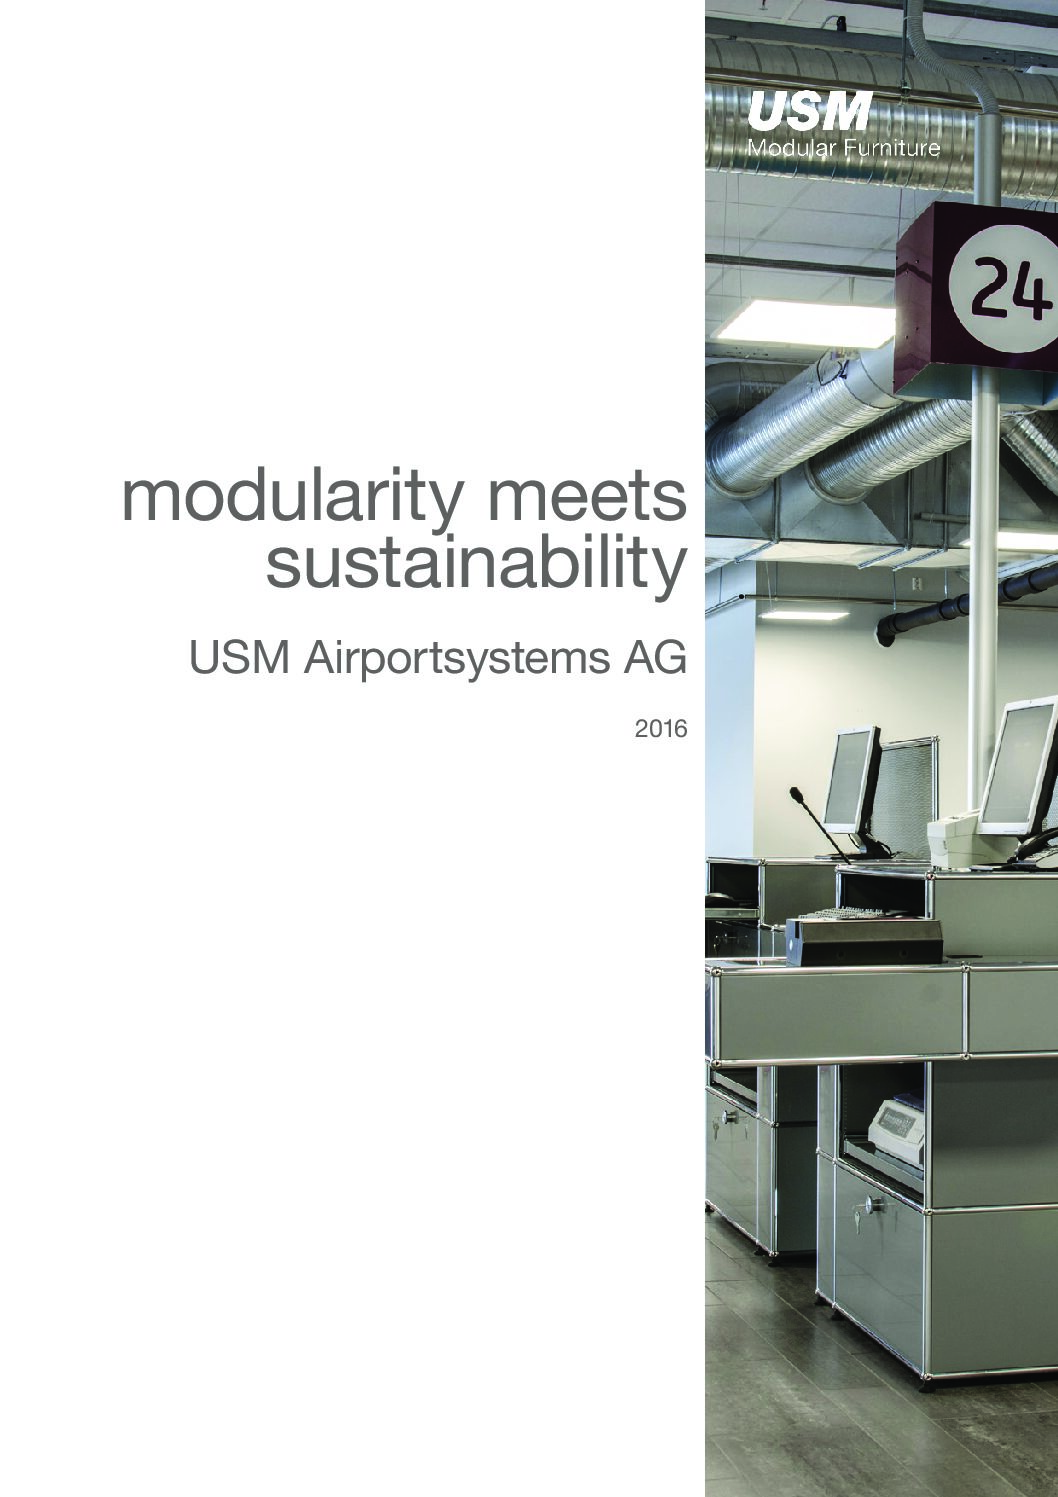 USM Modular Furniture Airport Brochure